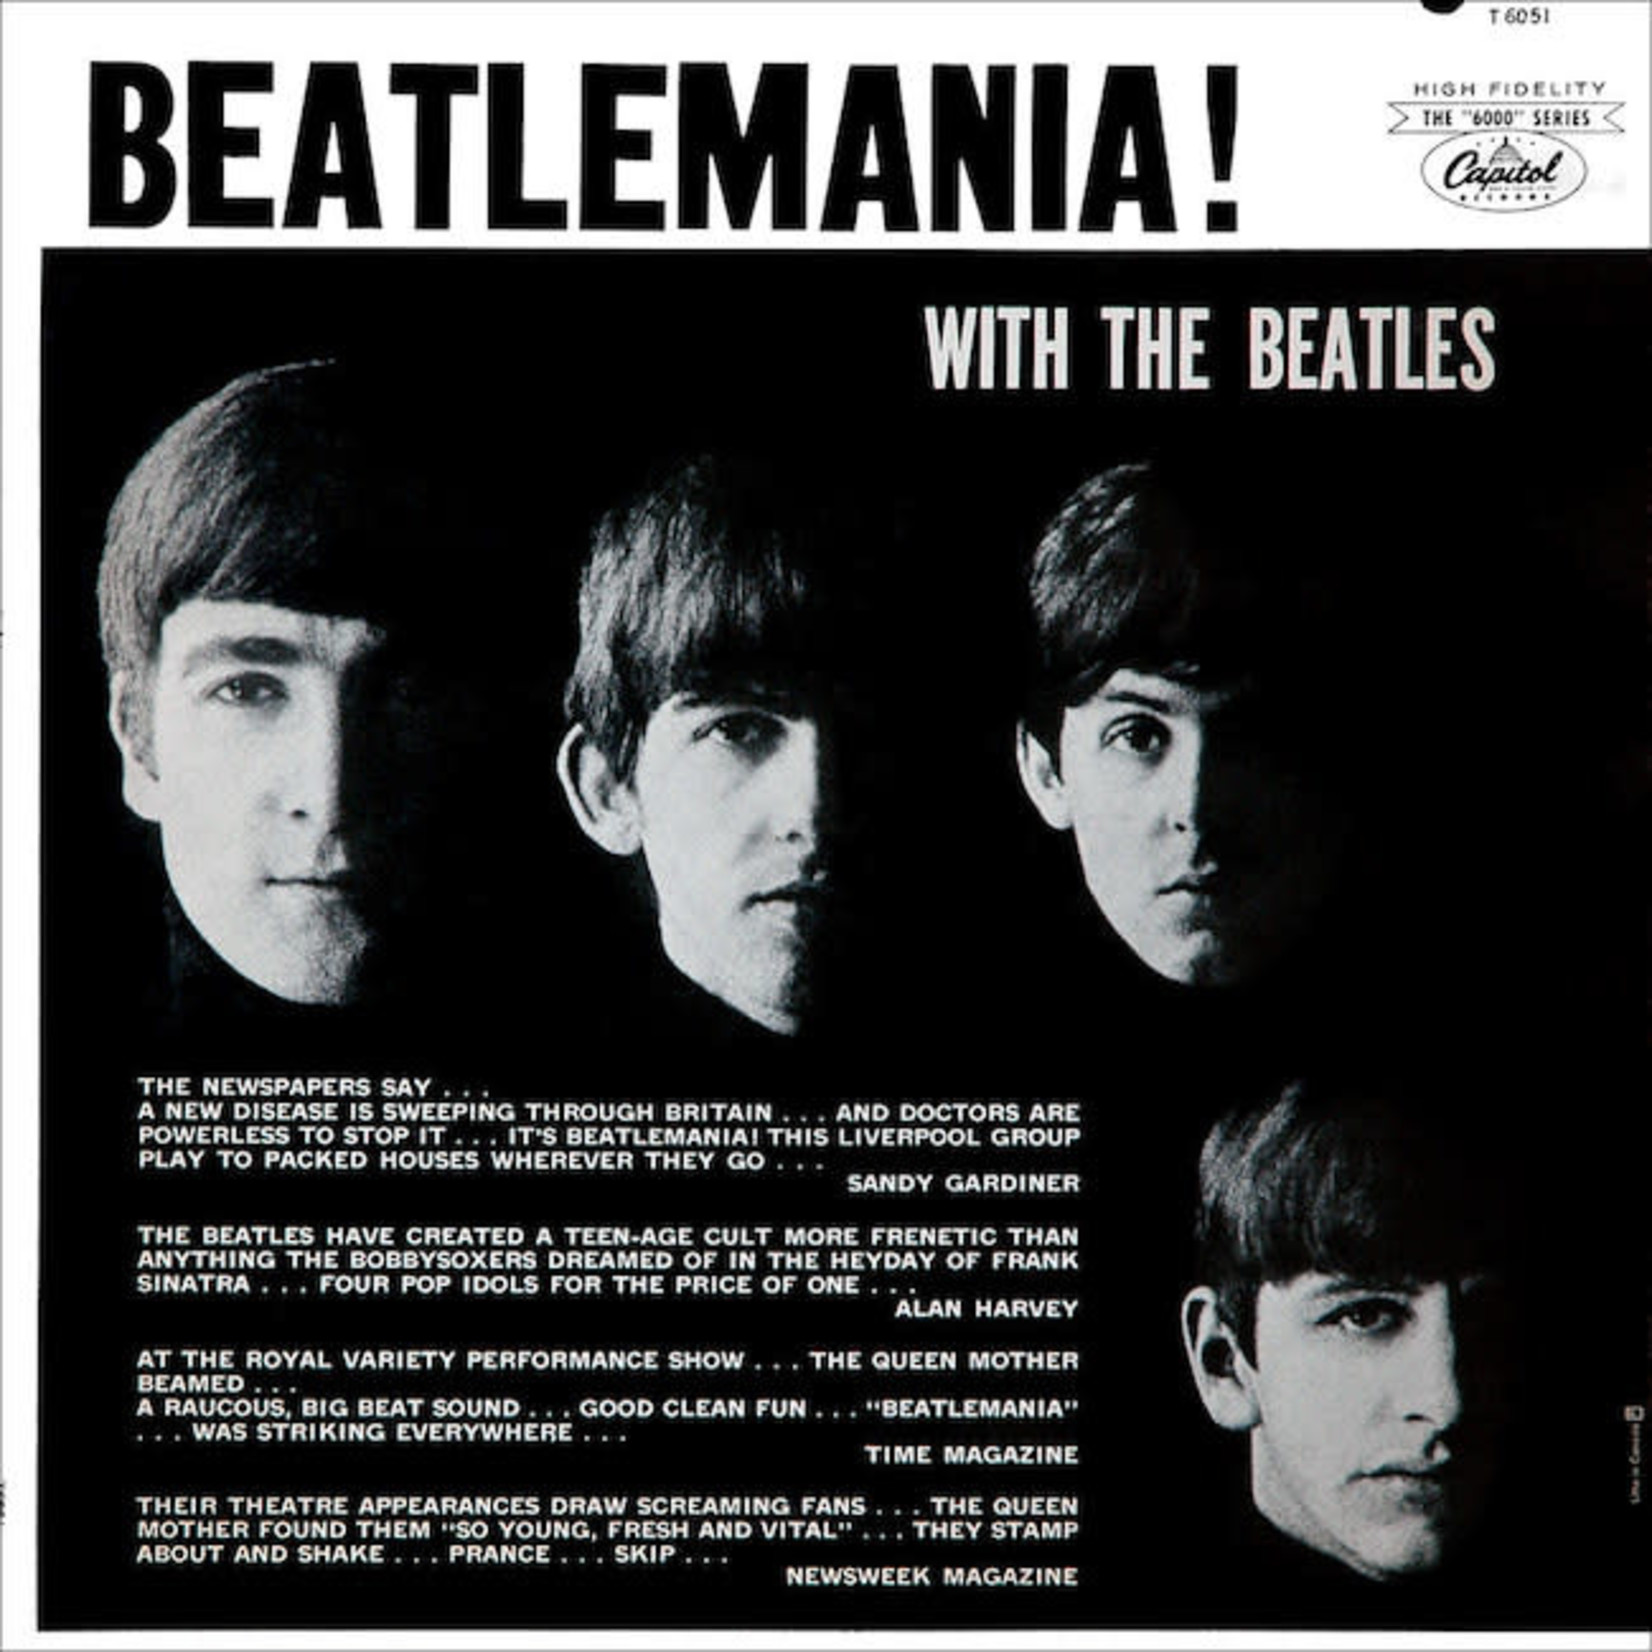 [Vintage] Beatles: Beatlemania! With the Beatles (Mono, reissue)